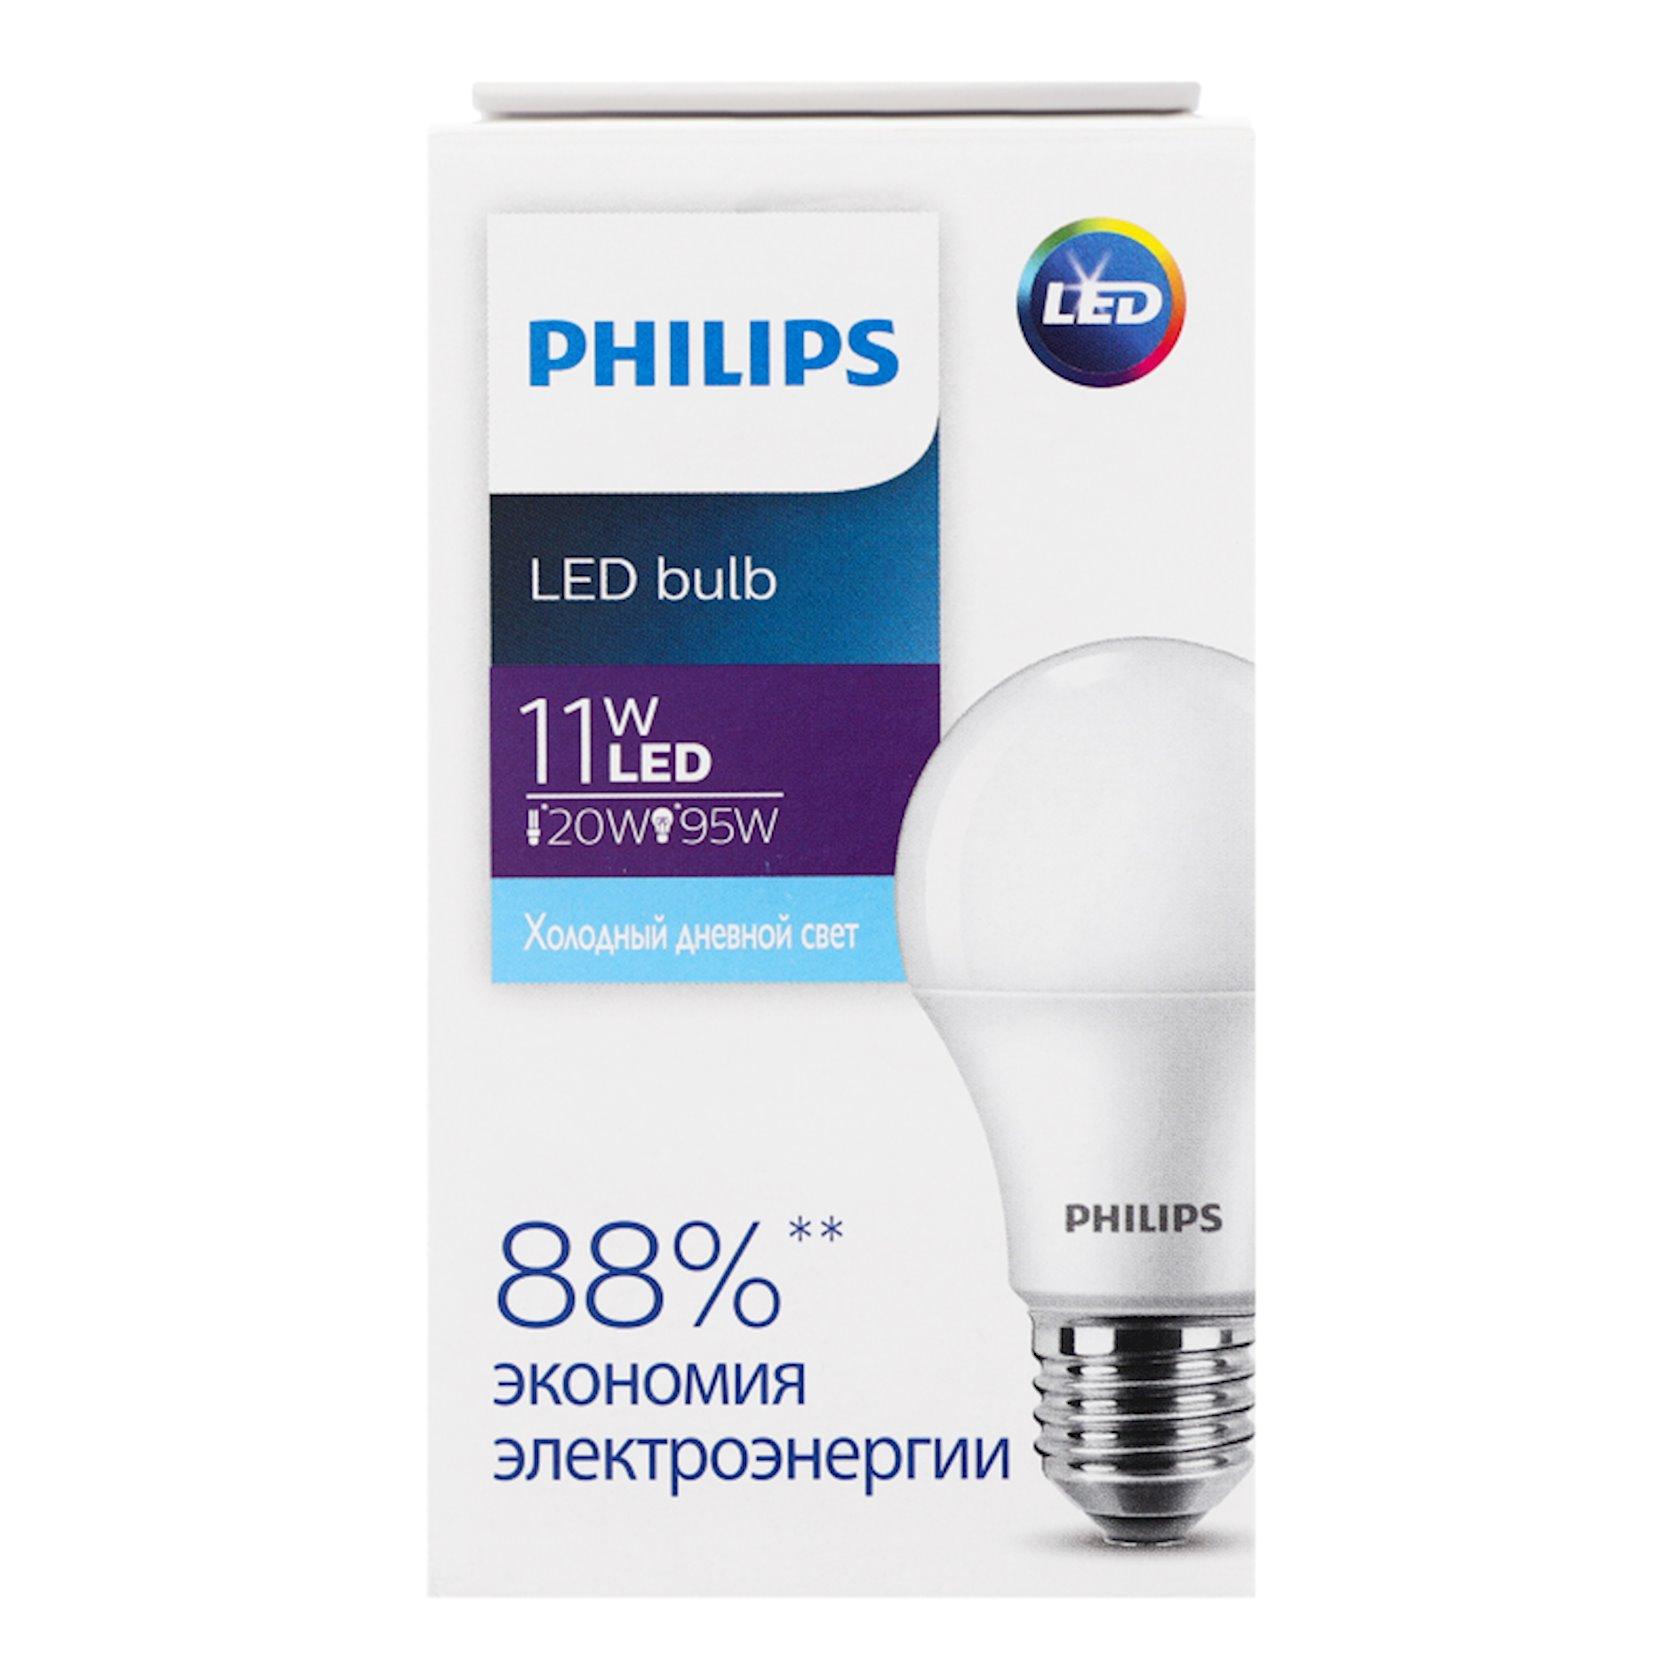 LED lampa Philips Ecohome Bulb 11W E27 6500K 1PF/20RCA, 10.8х6 sm, 36 q